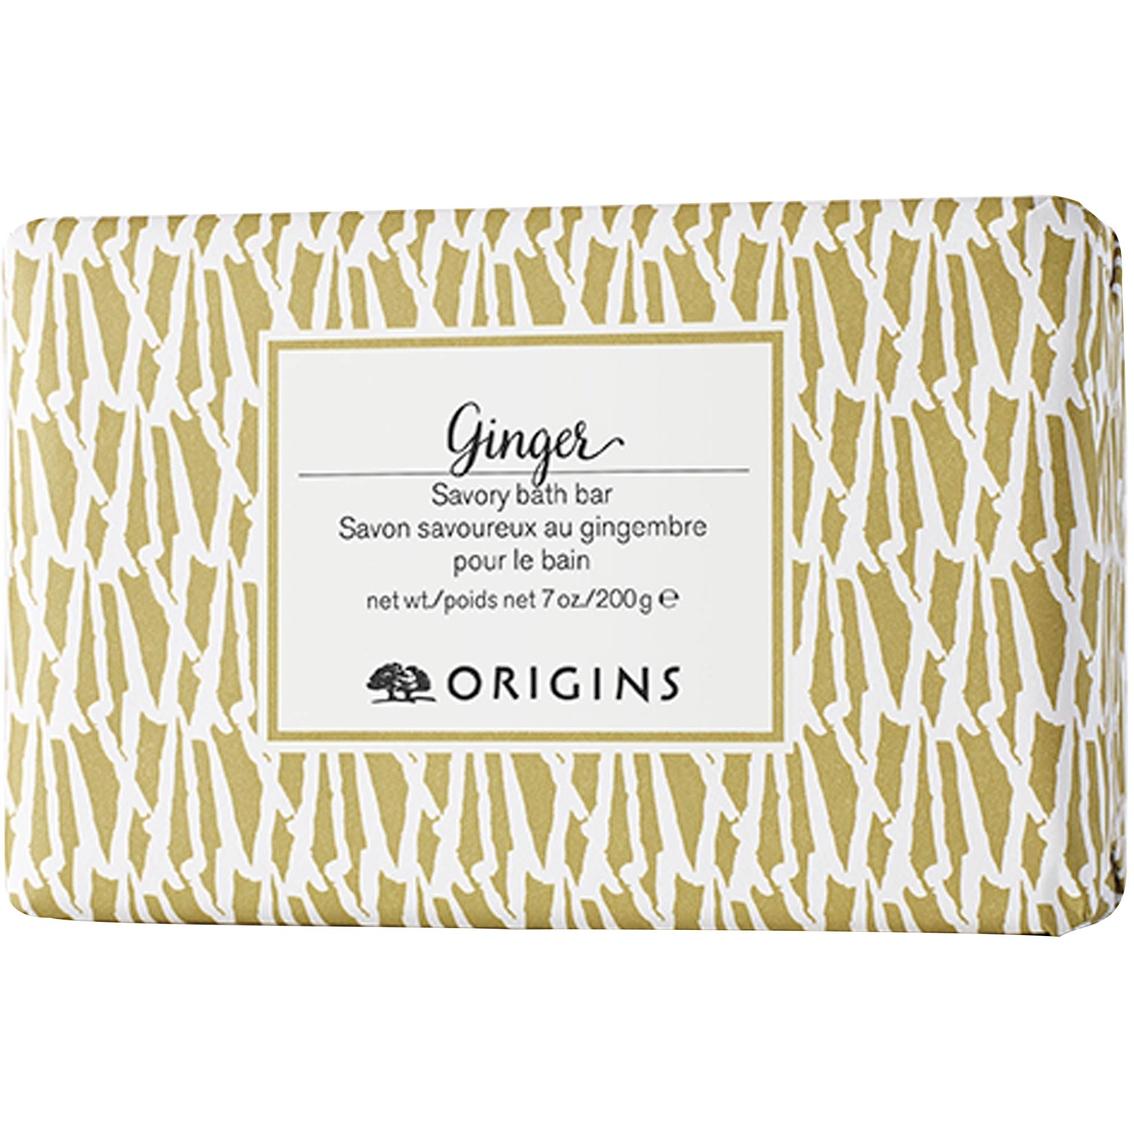 Origins Ginger Bar Savory Bath Soap Decorative Hand Bar Soaps